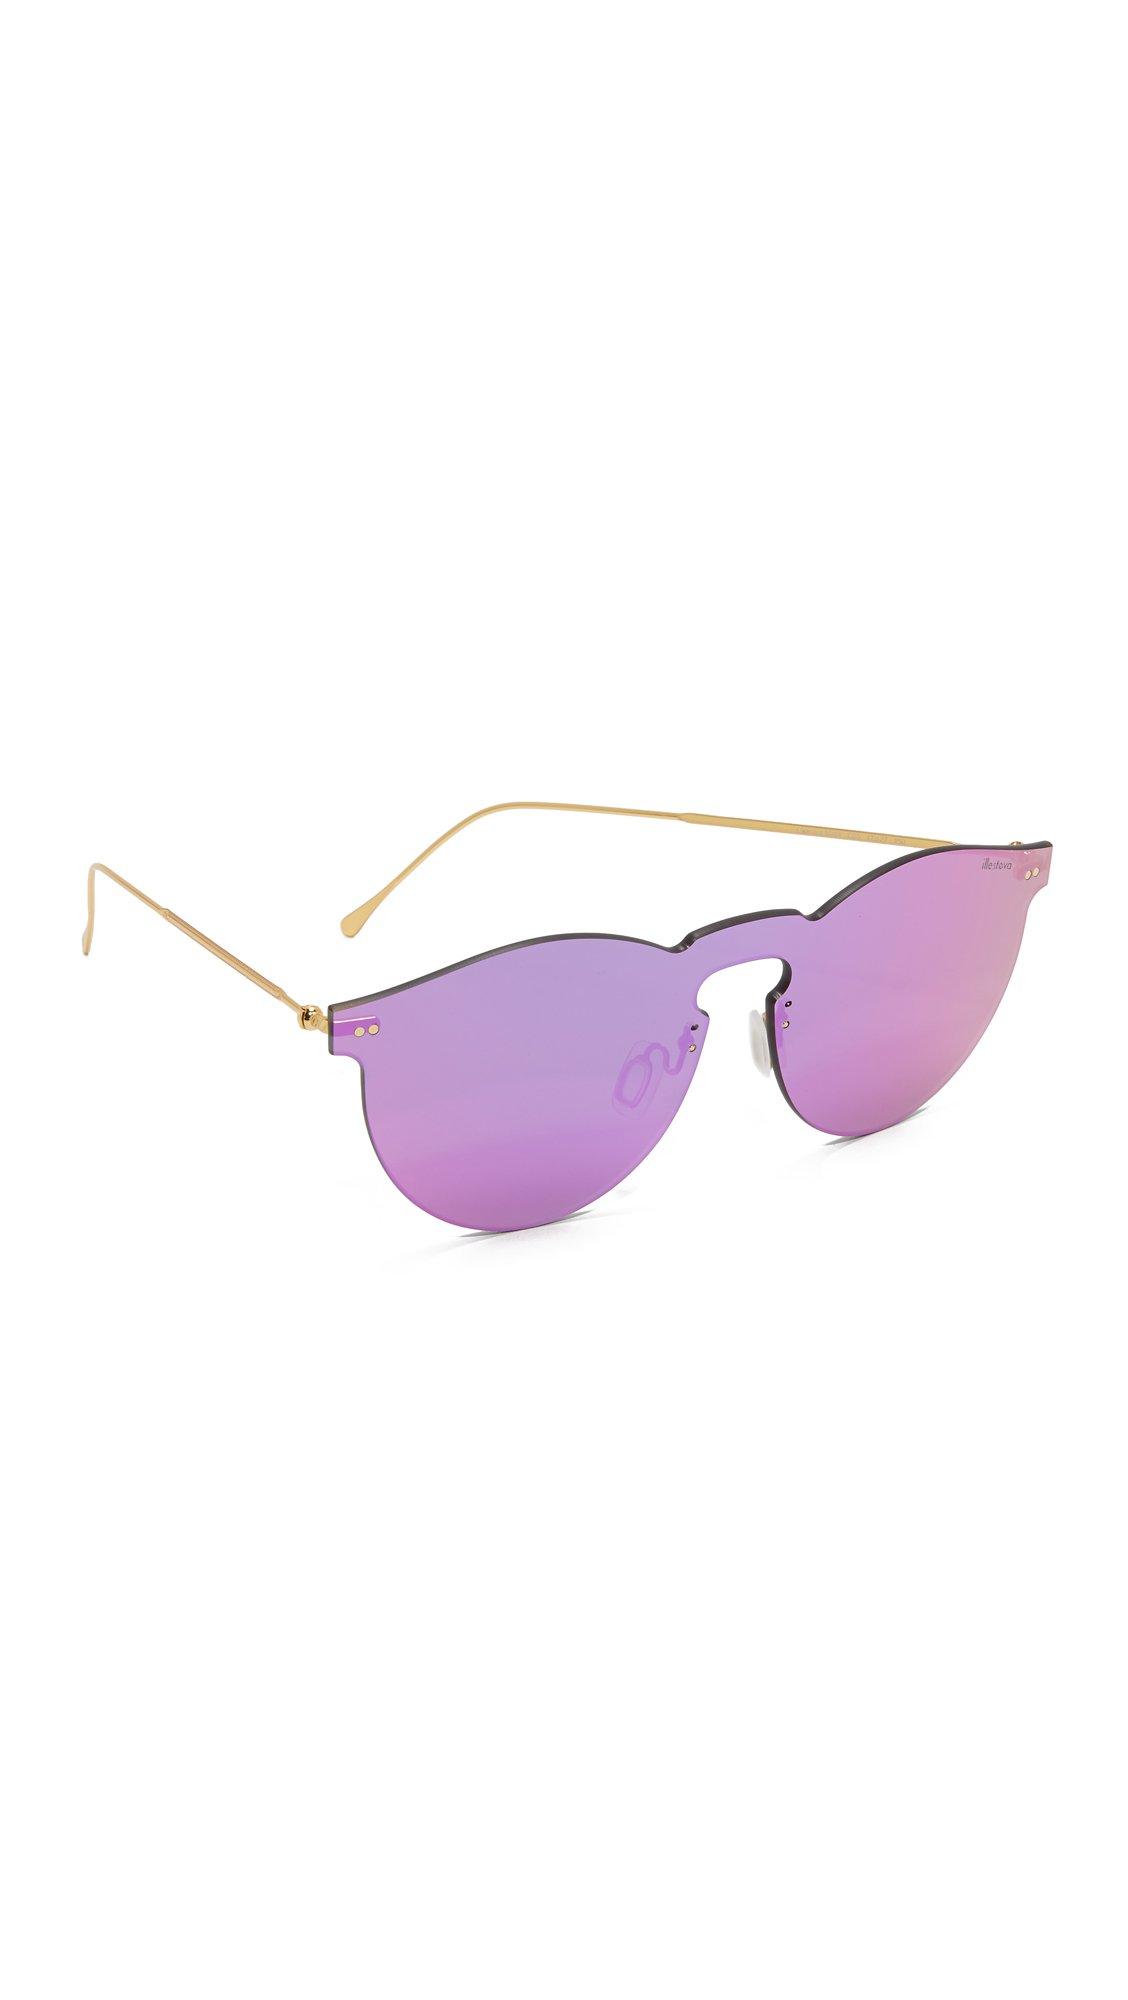 Illesteva Women's Leonard Mask Sunglasses, Pink/Pink, One Size